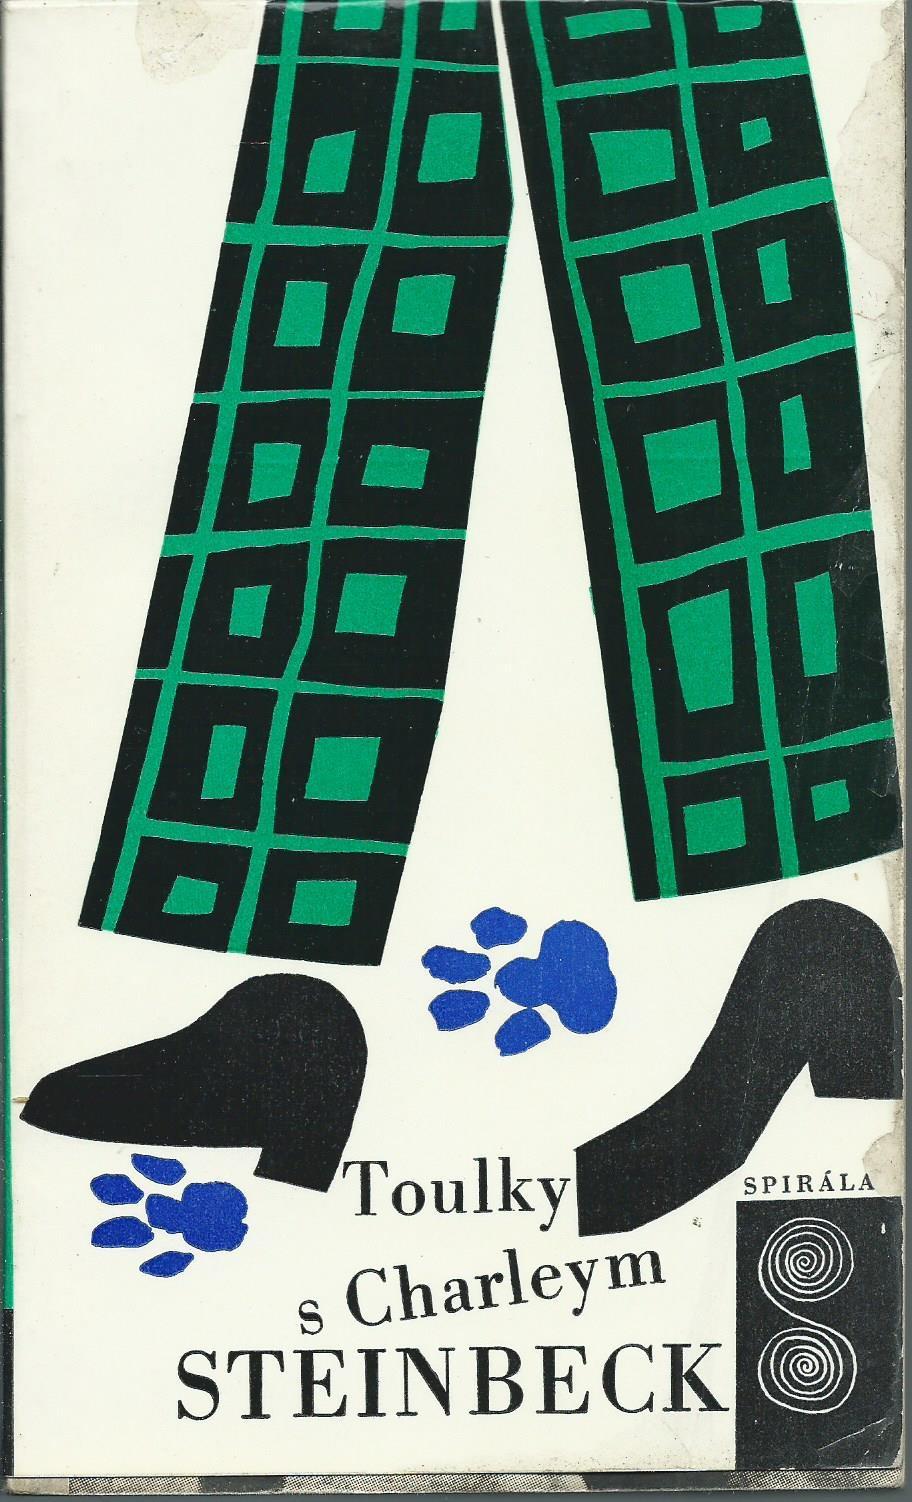 Toulky s Charleym -John Steinbeck